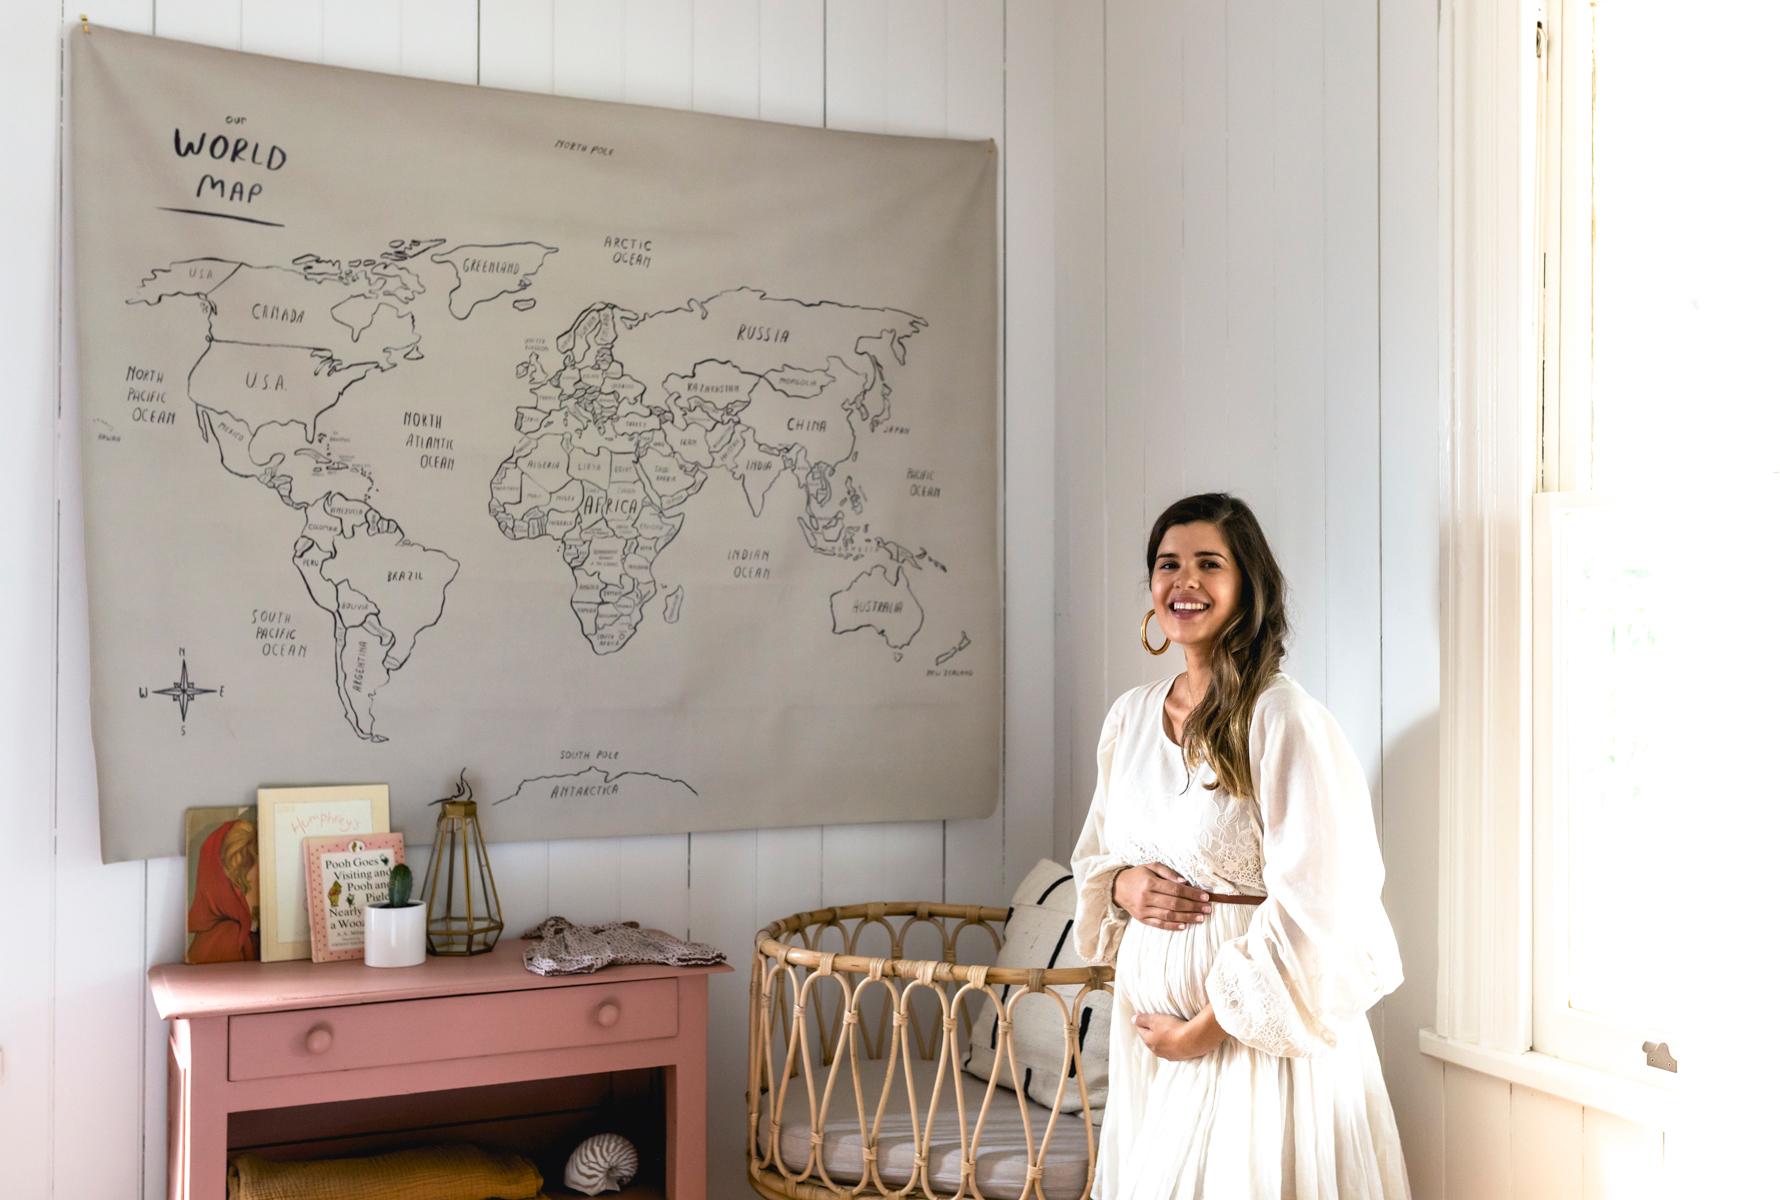 Geneva Vanderzeil Welcomes Her Best DIY Project To Date – Baby Frankie!